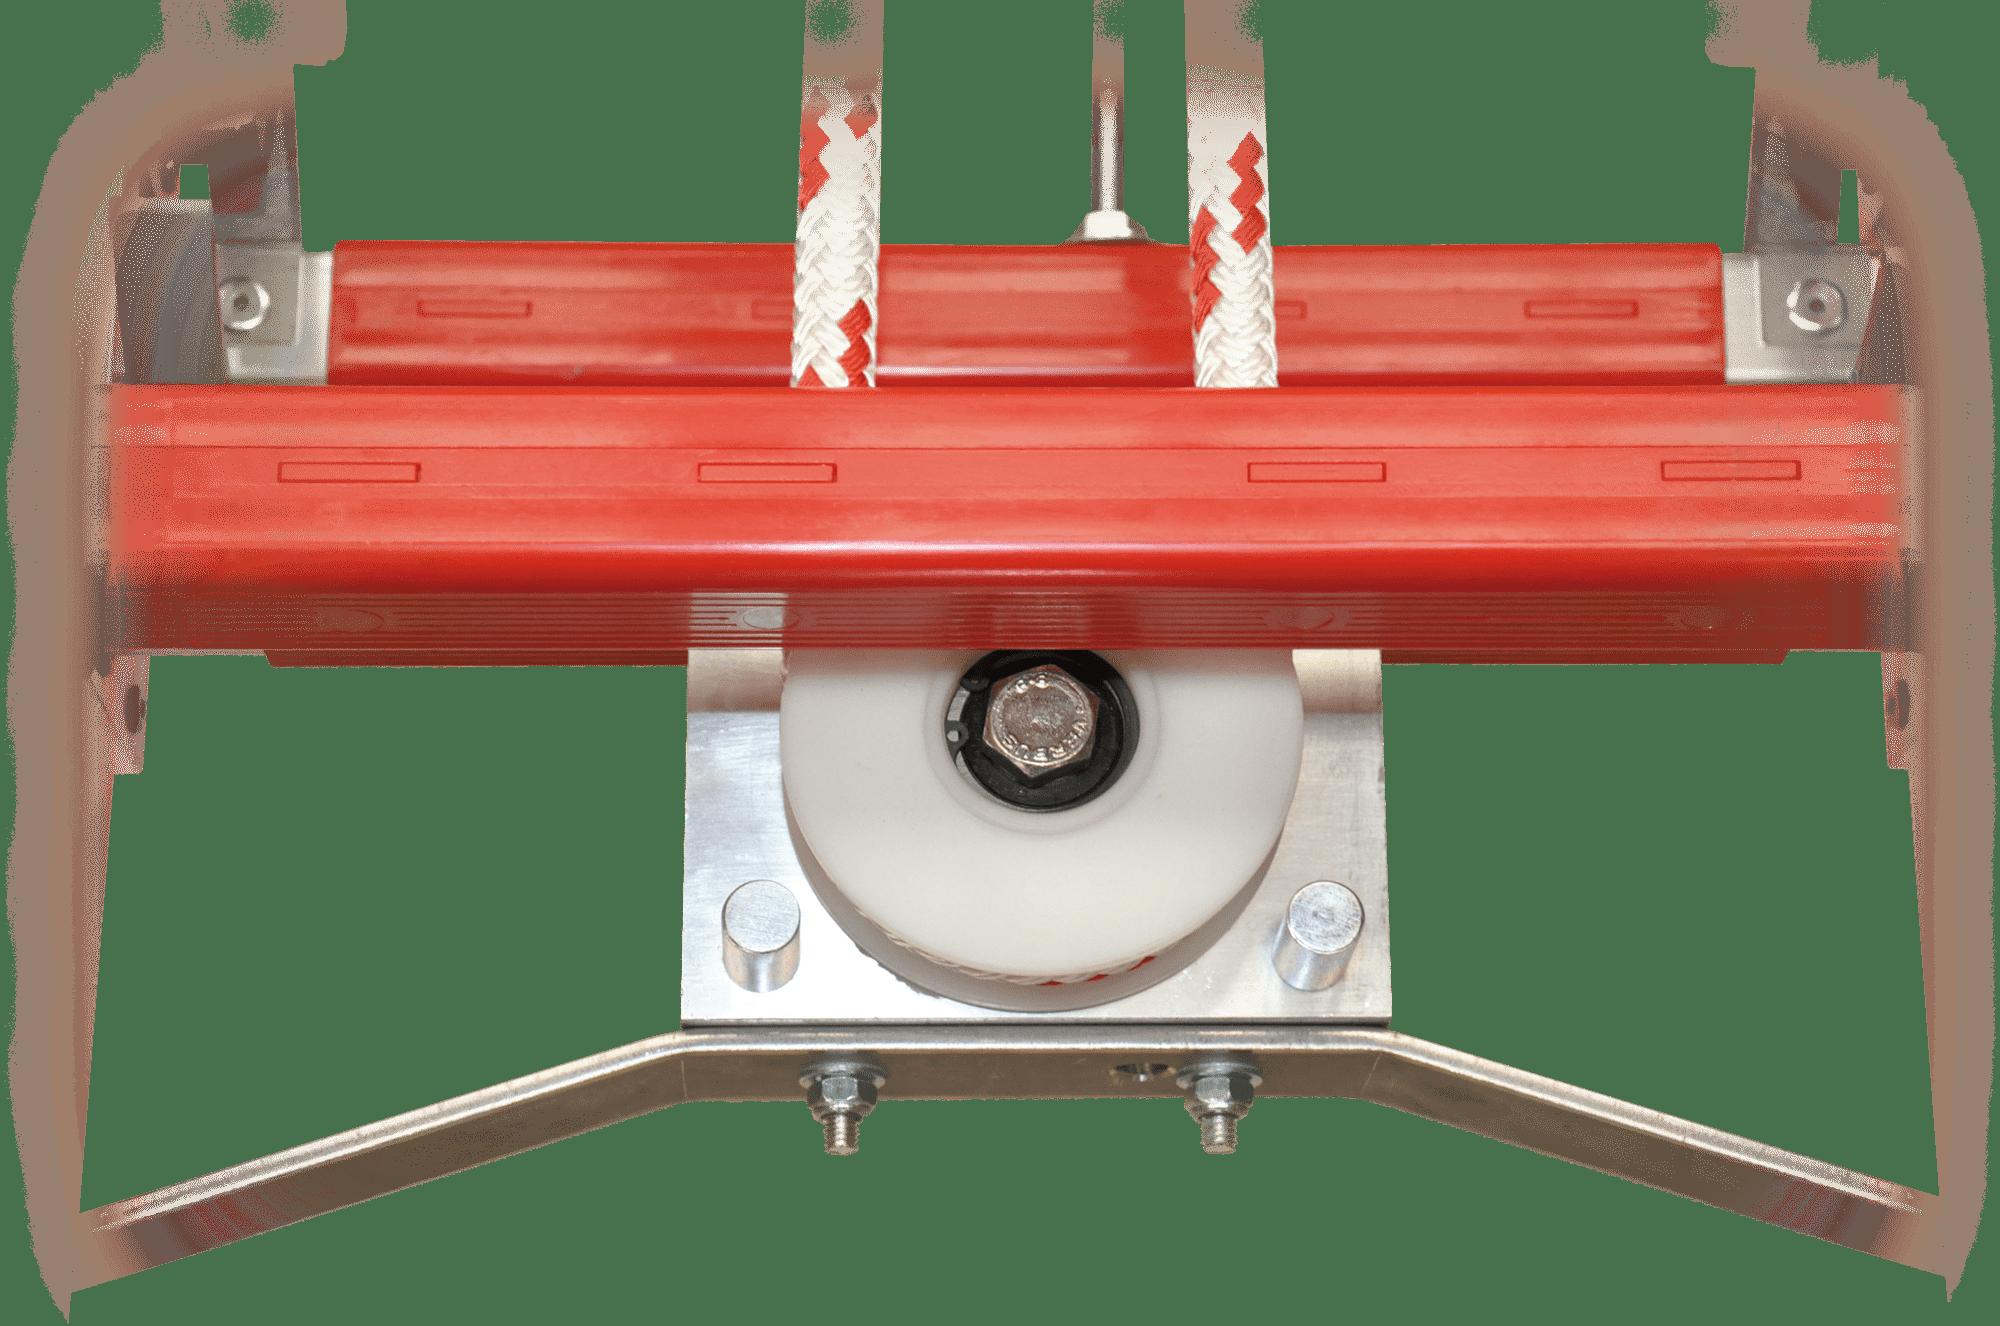 hasičský rebrík kladka